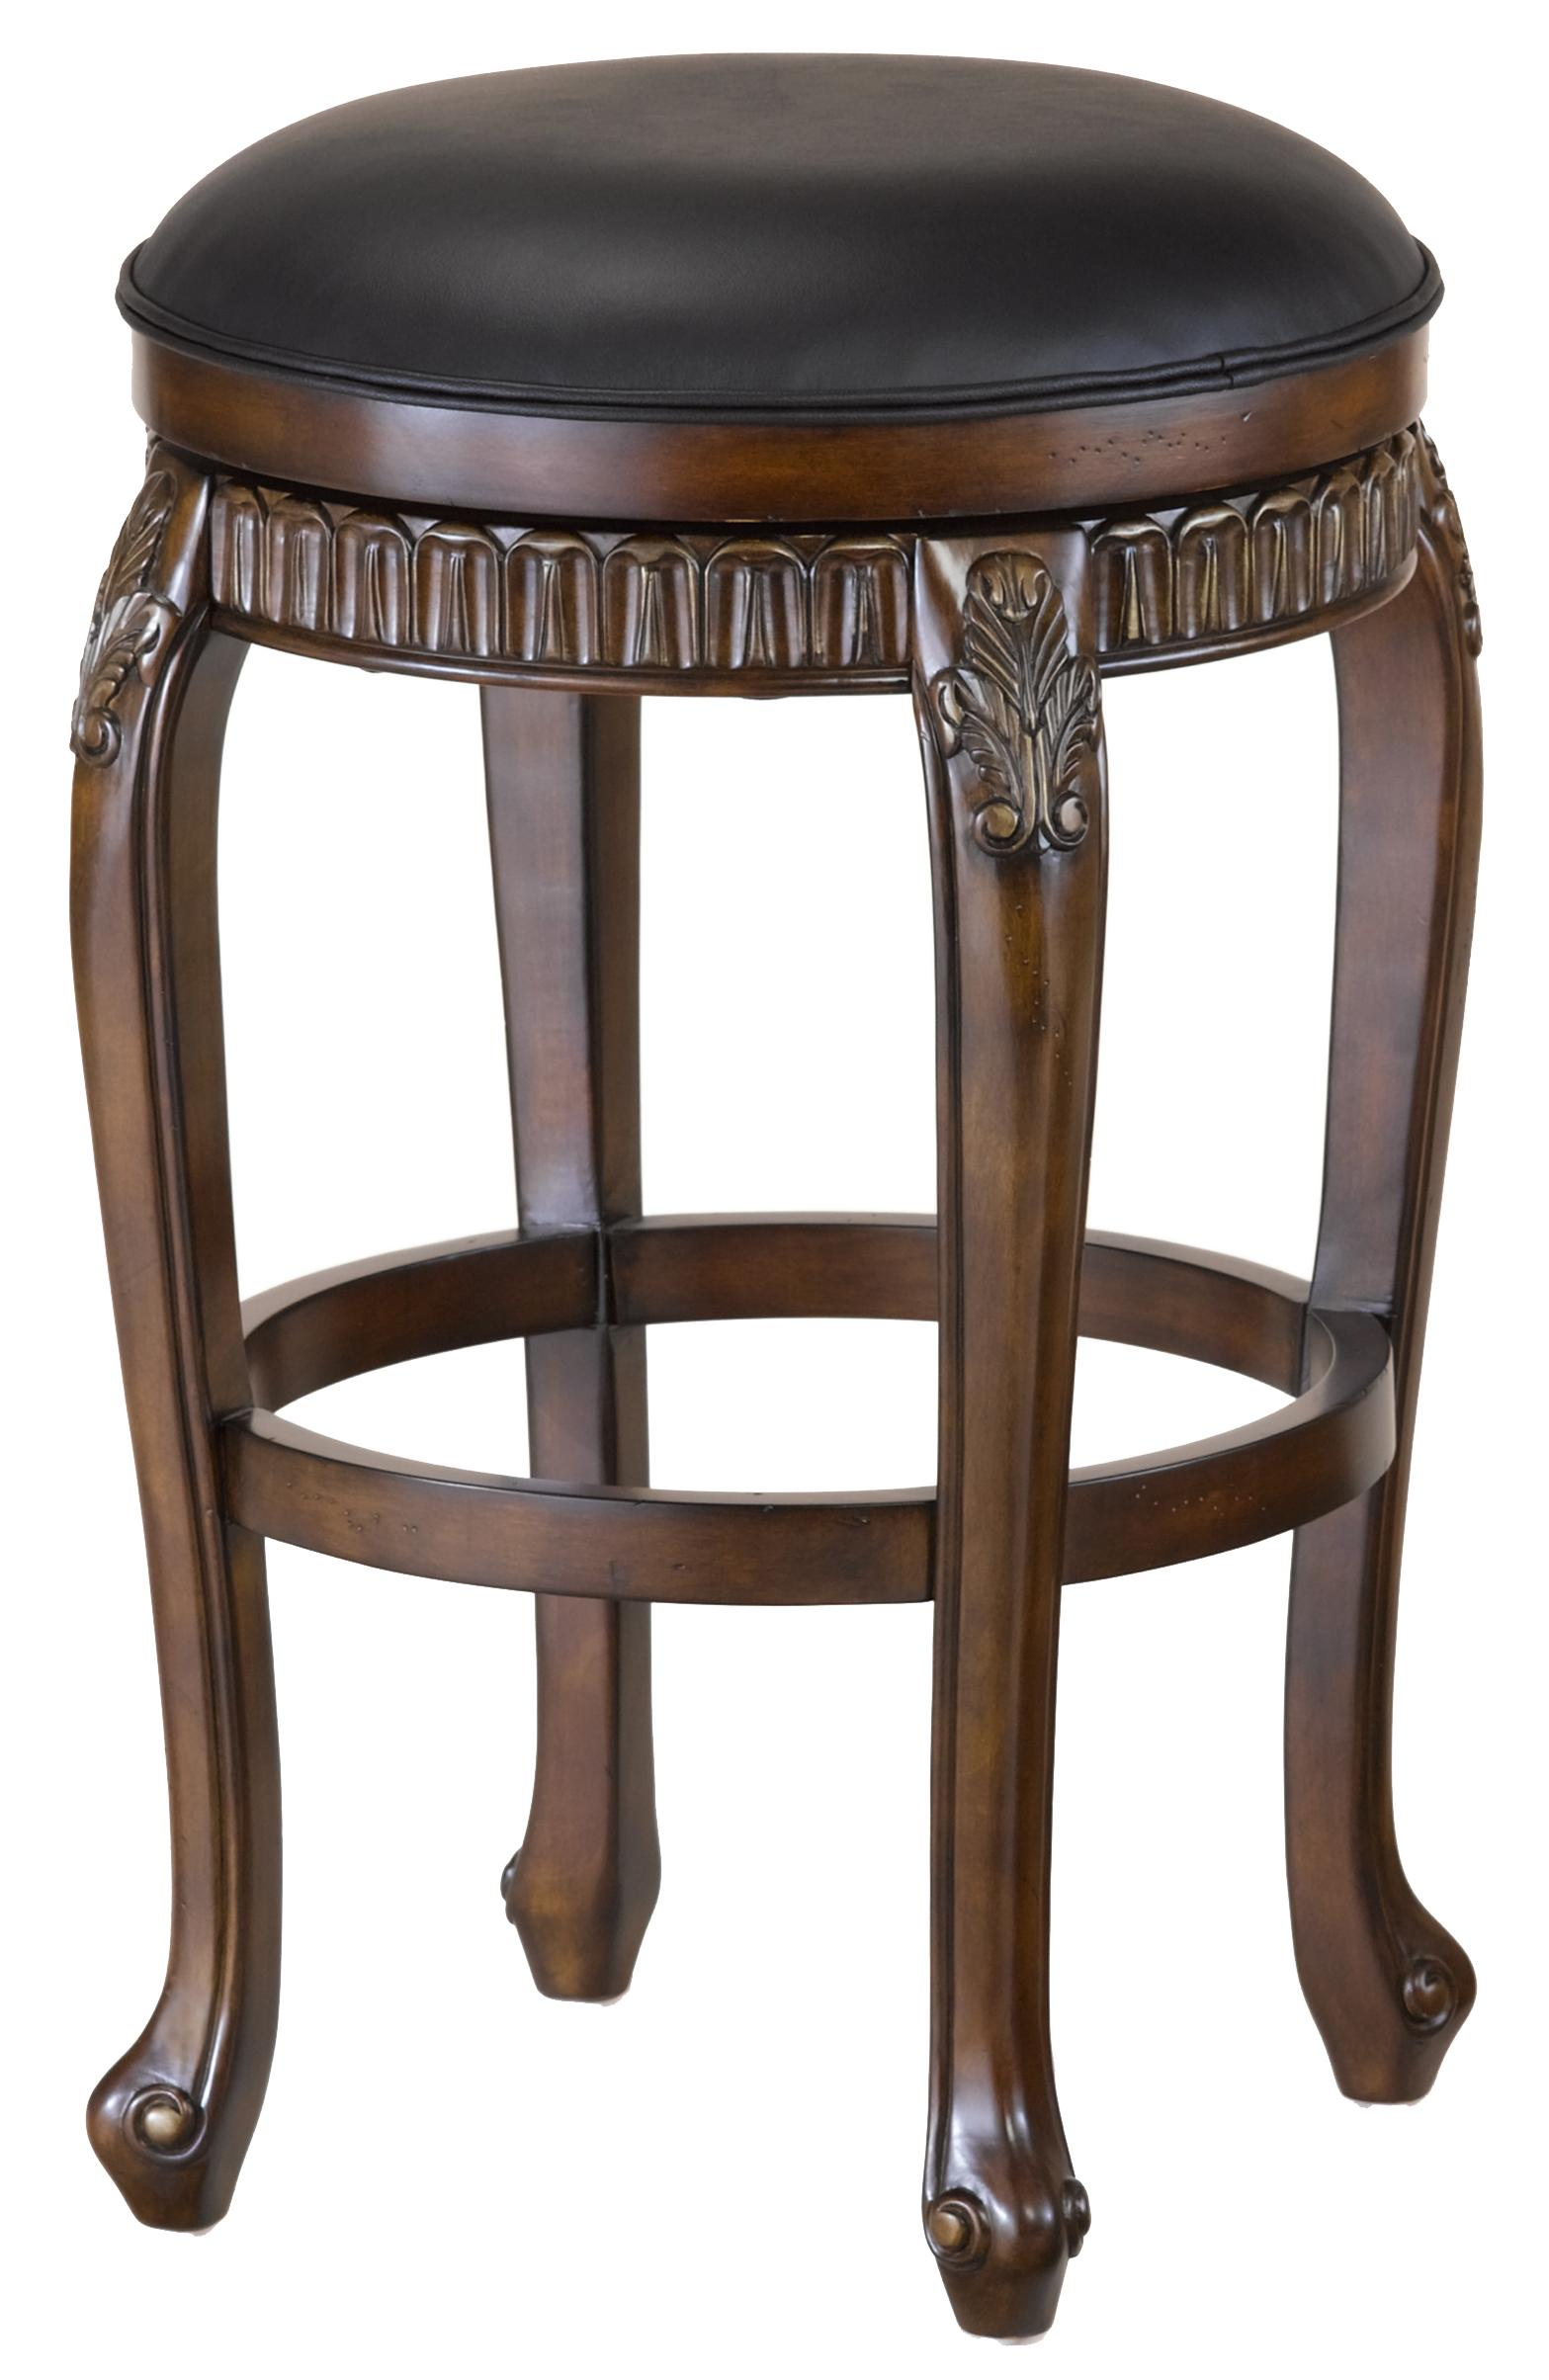 backless chair height stool ikea slipcovers hillsdale wood stools 30 quot bar fleur de lis